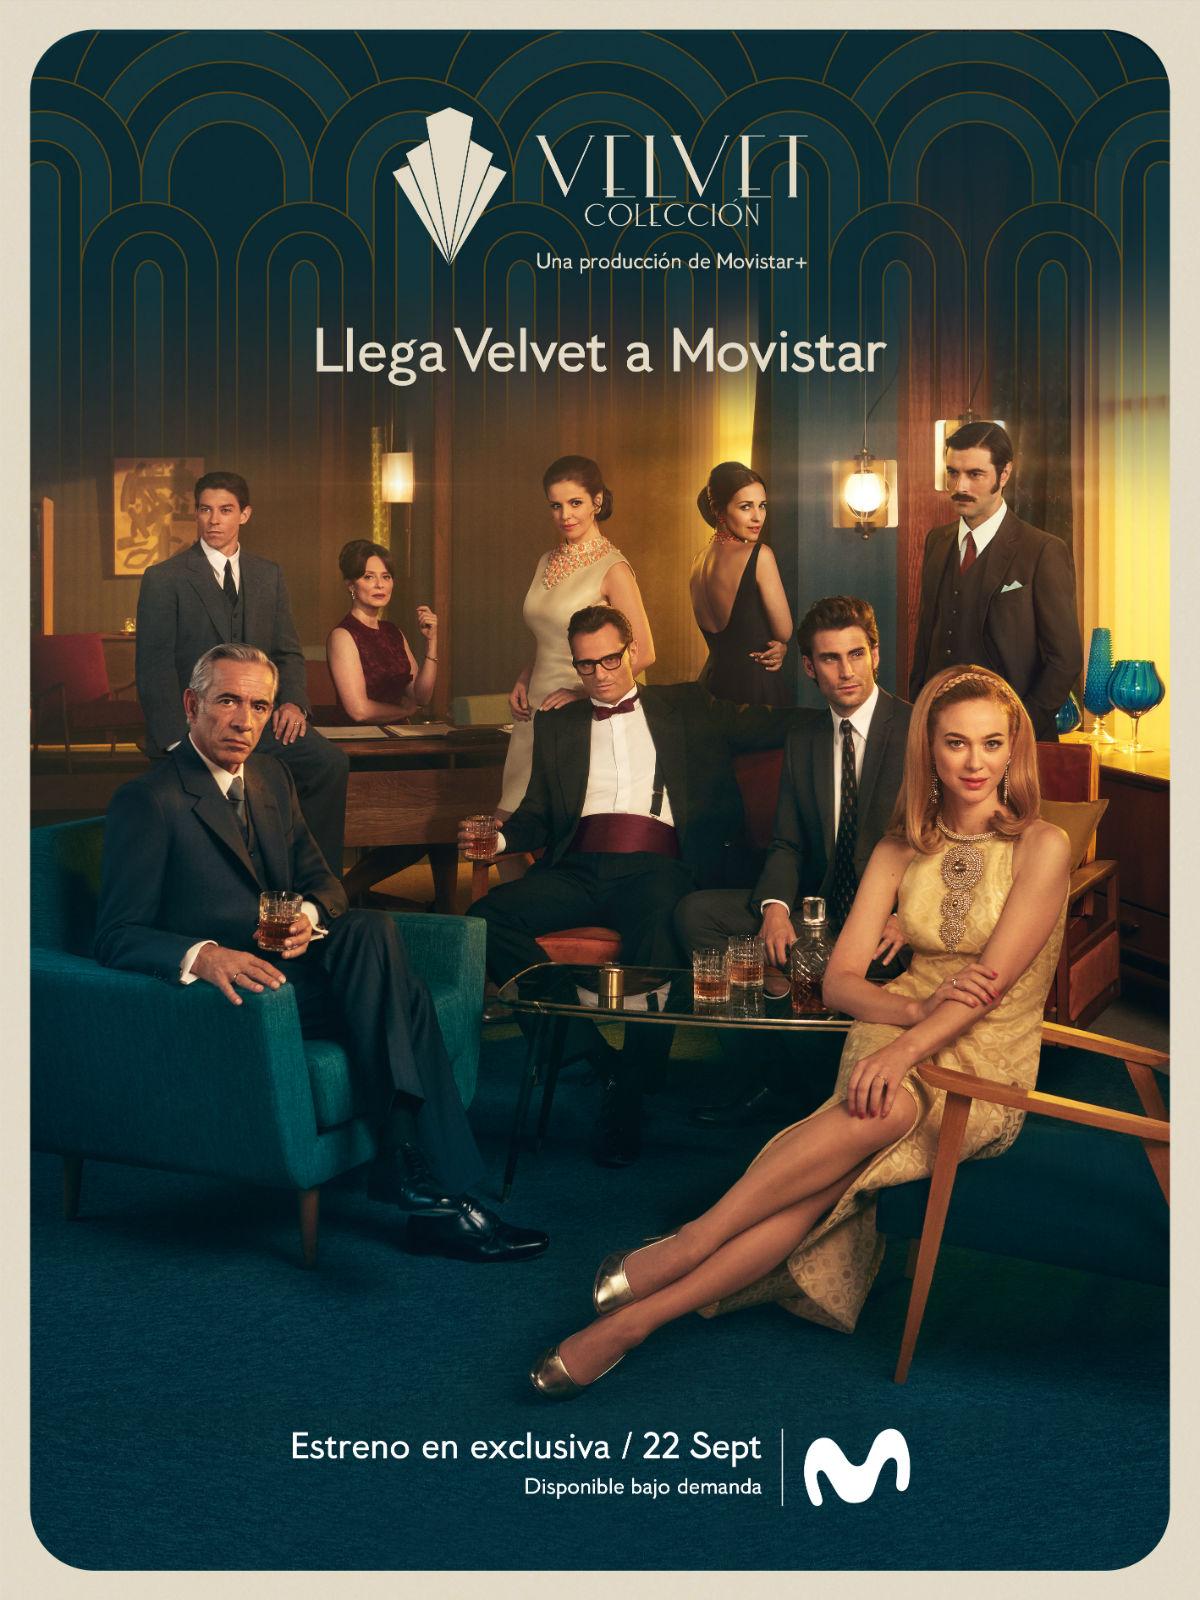 Velvet Staffel 3 Netflix